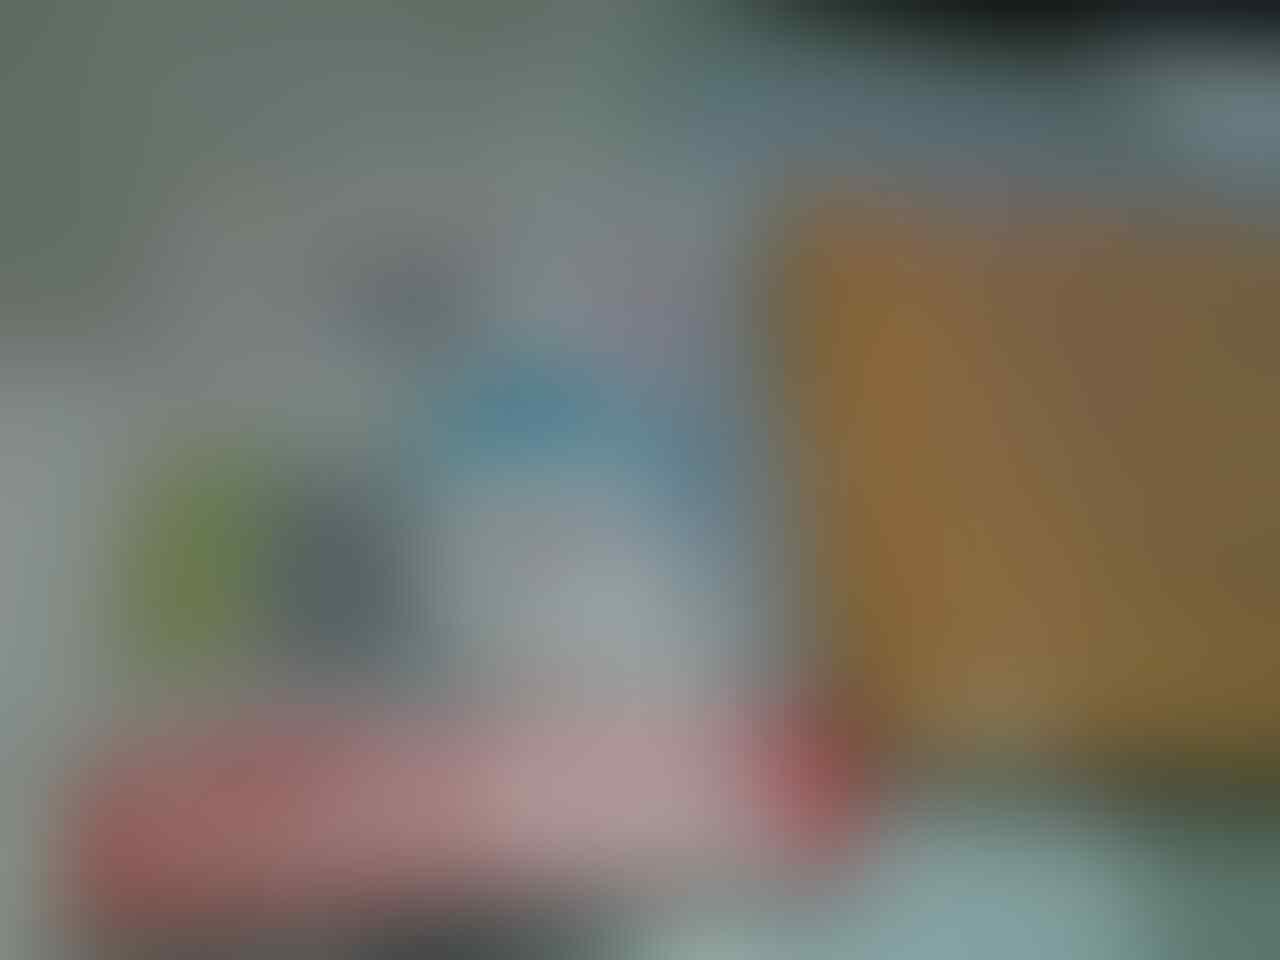 MICROSD CLASS 10 UHS-1 8GB 16GB 32GB 64GB MICRO SD SAMSUNG TOSHIBA SANDISK TERMURAH